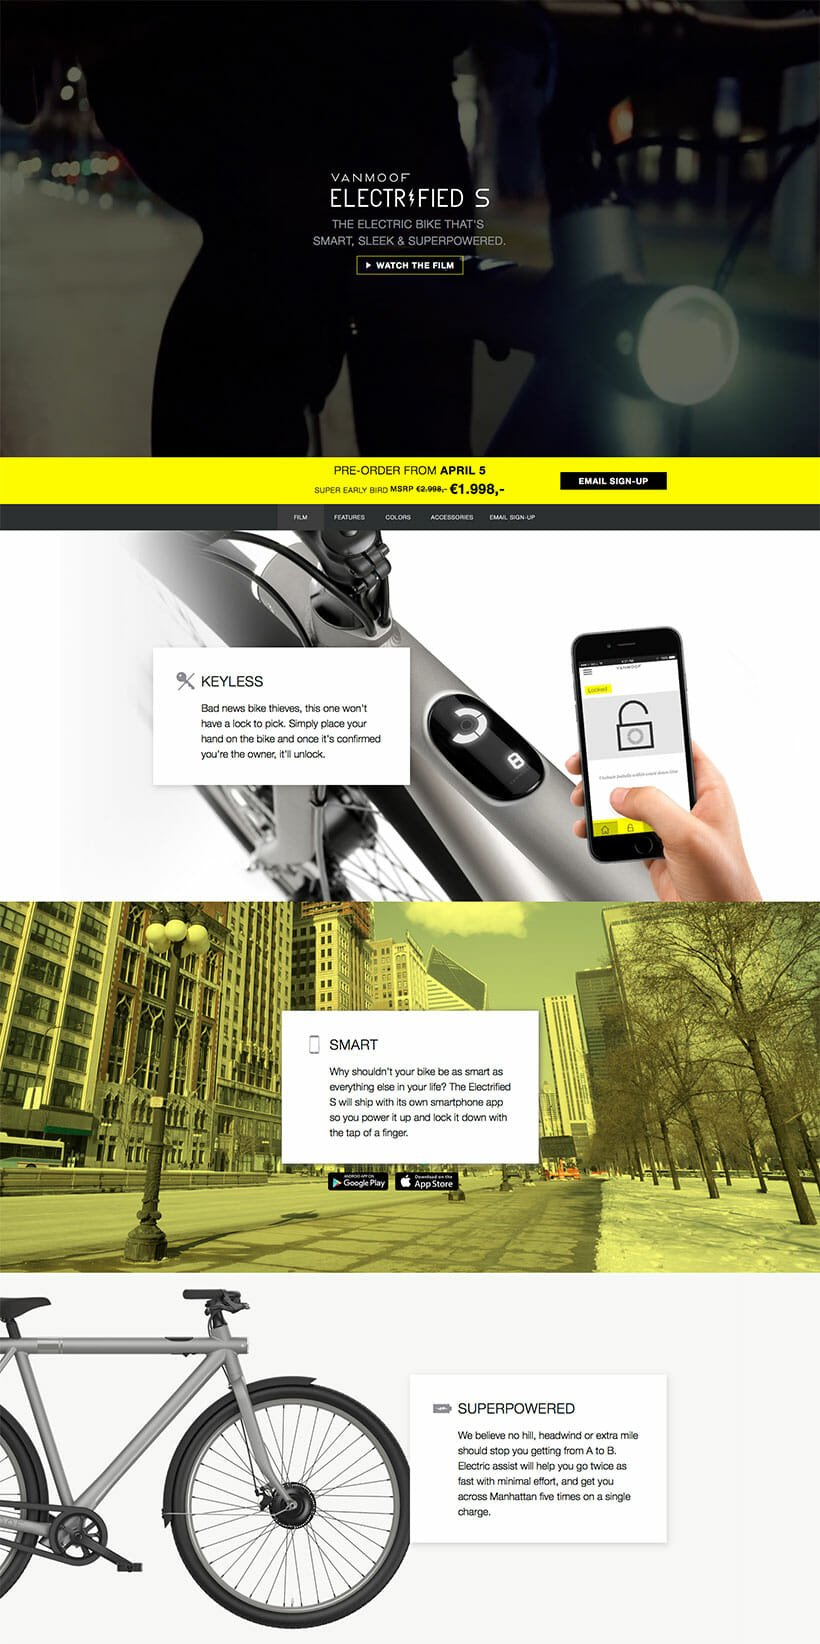 google-self-driving-bike-vanmoof-electrified